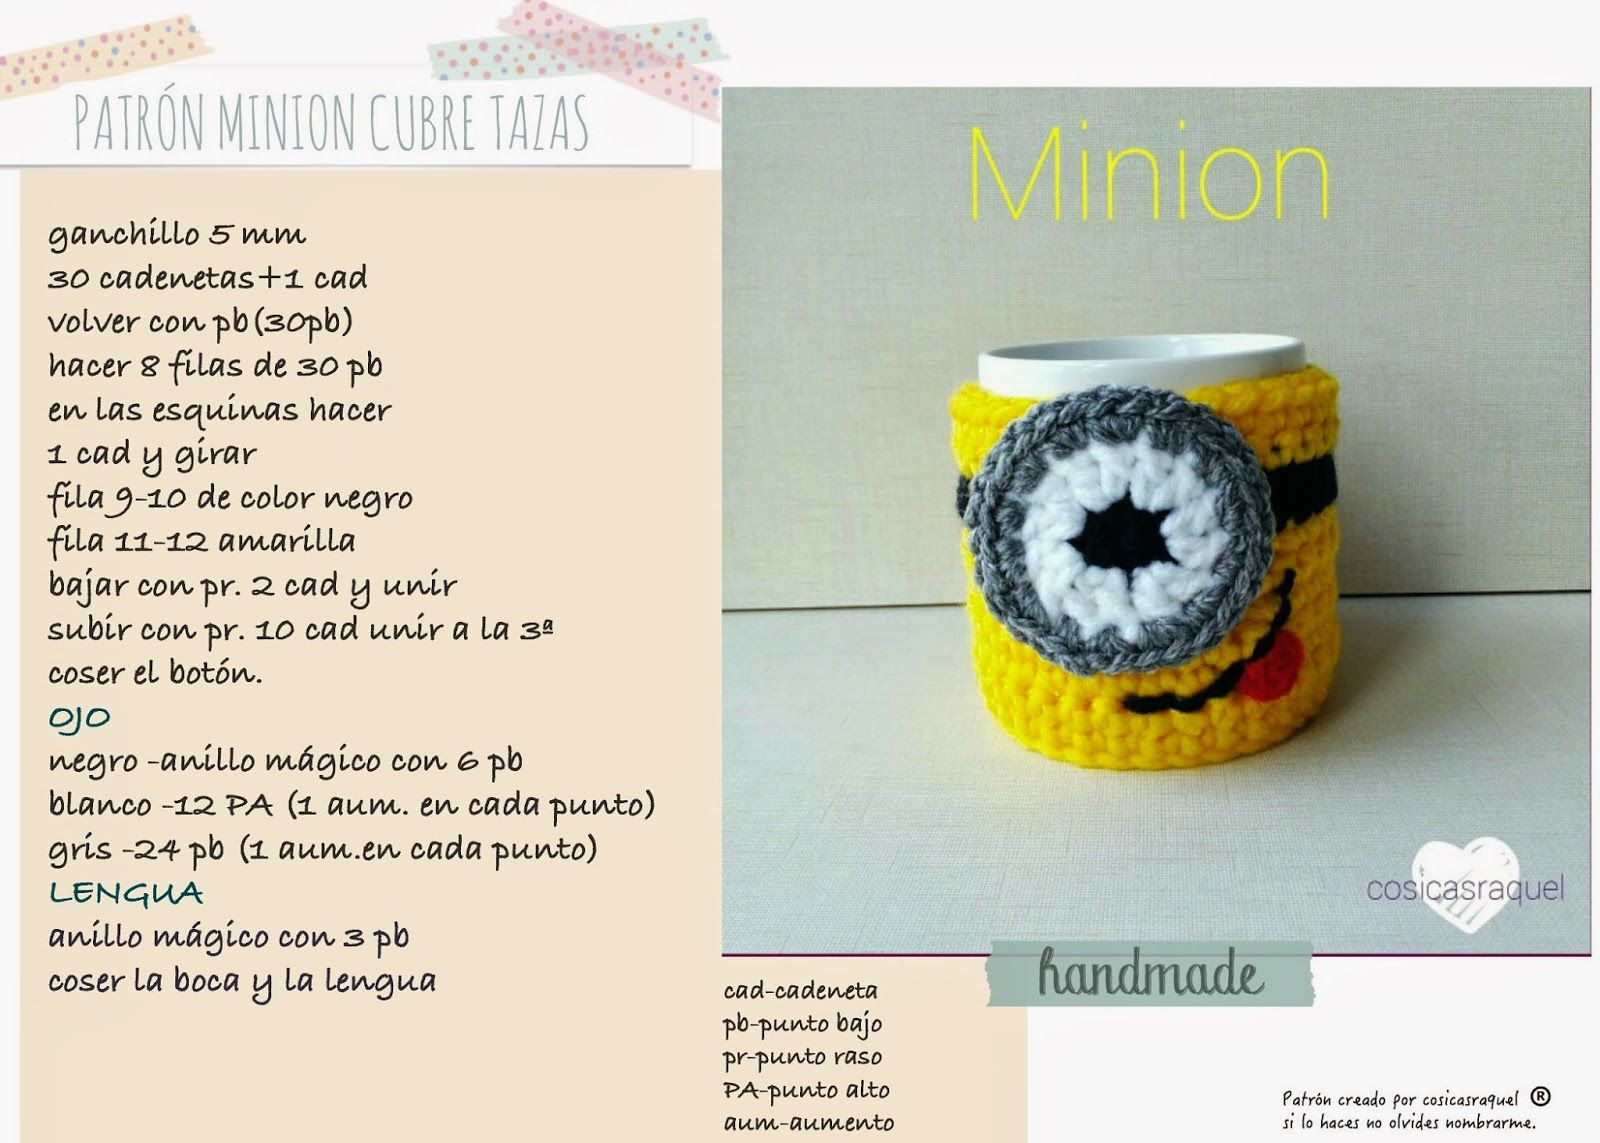 PATRÓN CUBRE TAZAS MINION DE CROCHET   Crochet   Pinterest ...